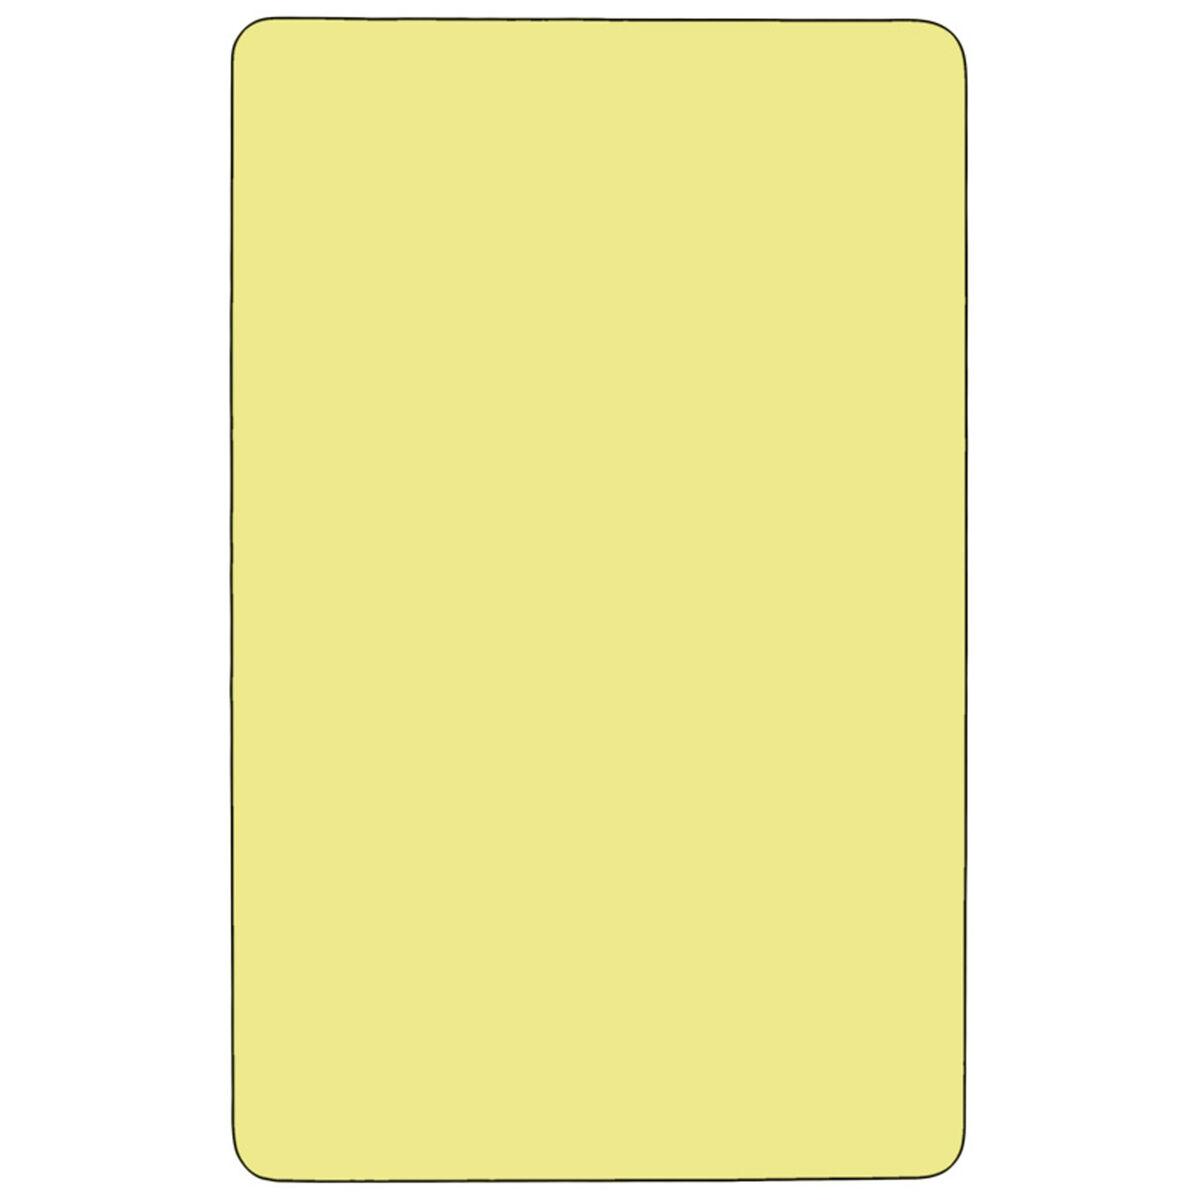 24x48 Yellow Activity Table Xu A2448 Rec Yel T A Gg